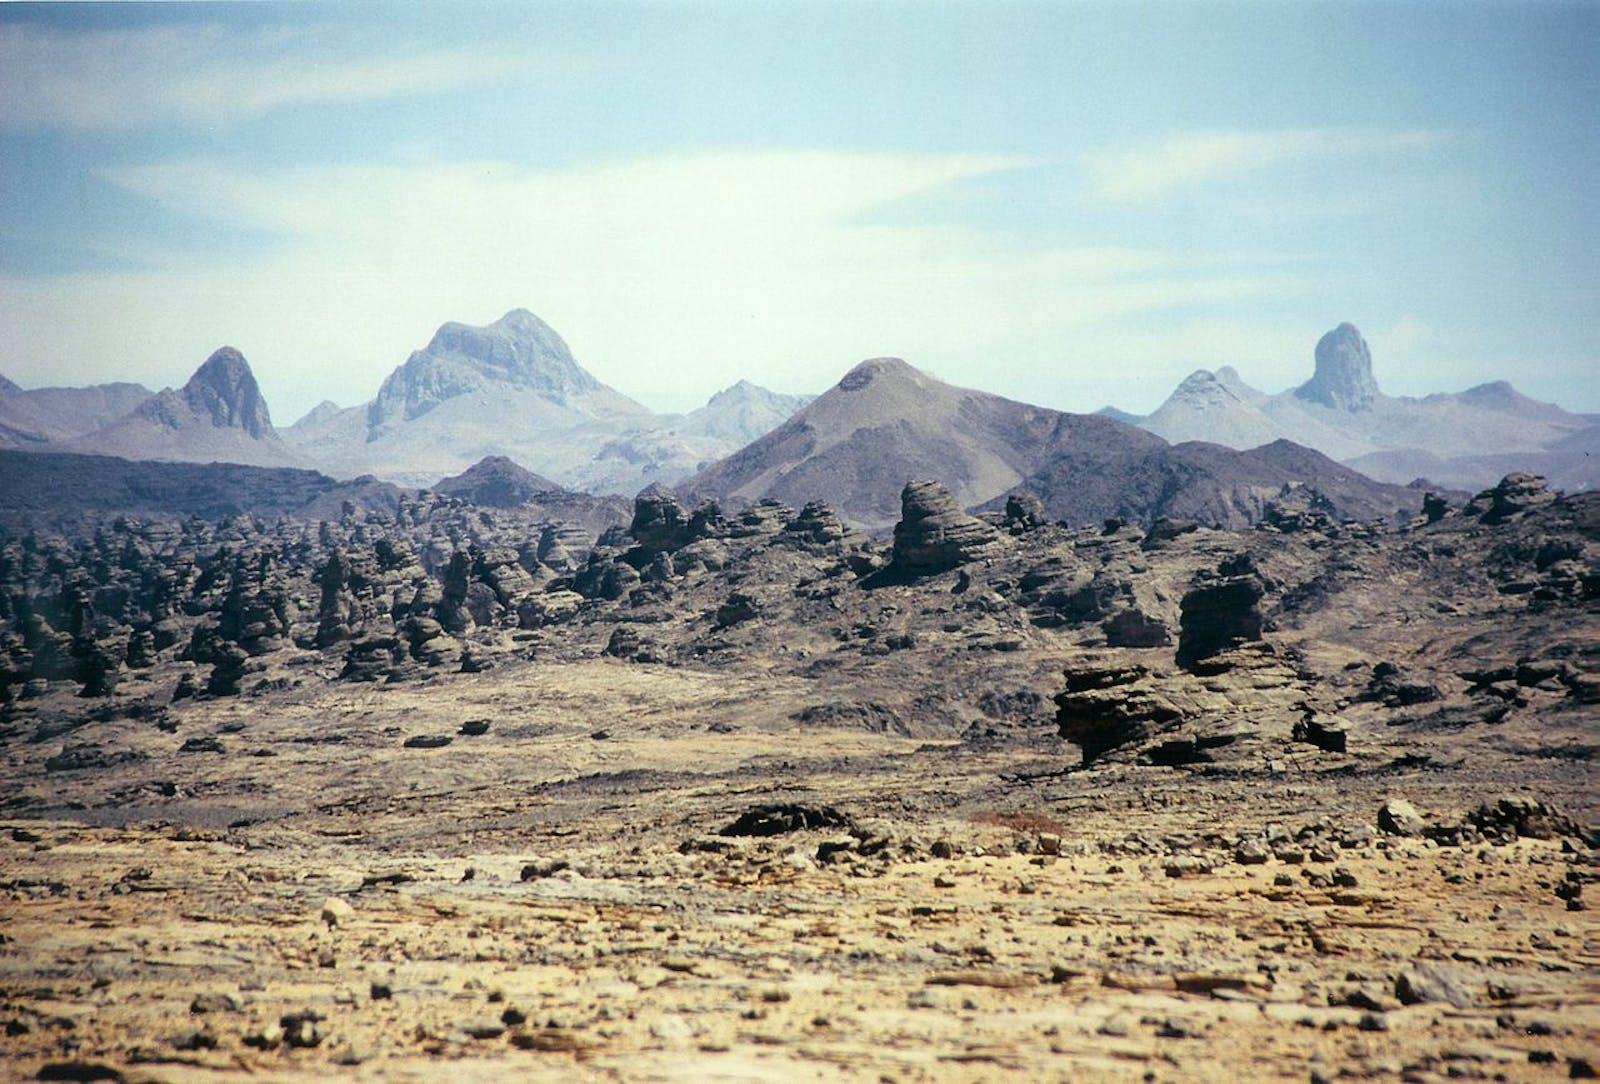 Tibesti-Jebel Uweinat Montane Xeric Woodlands